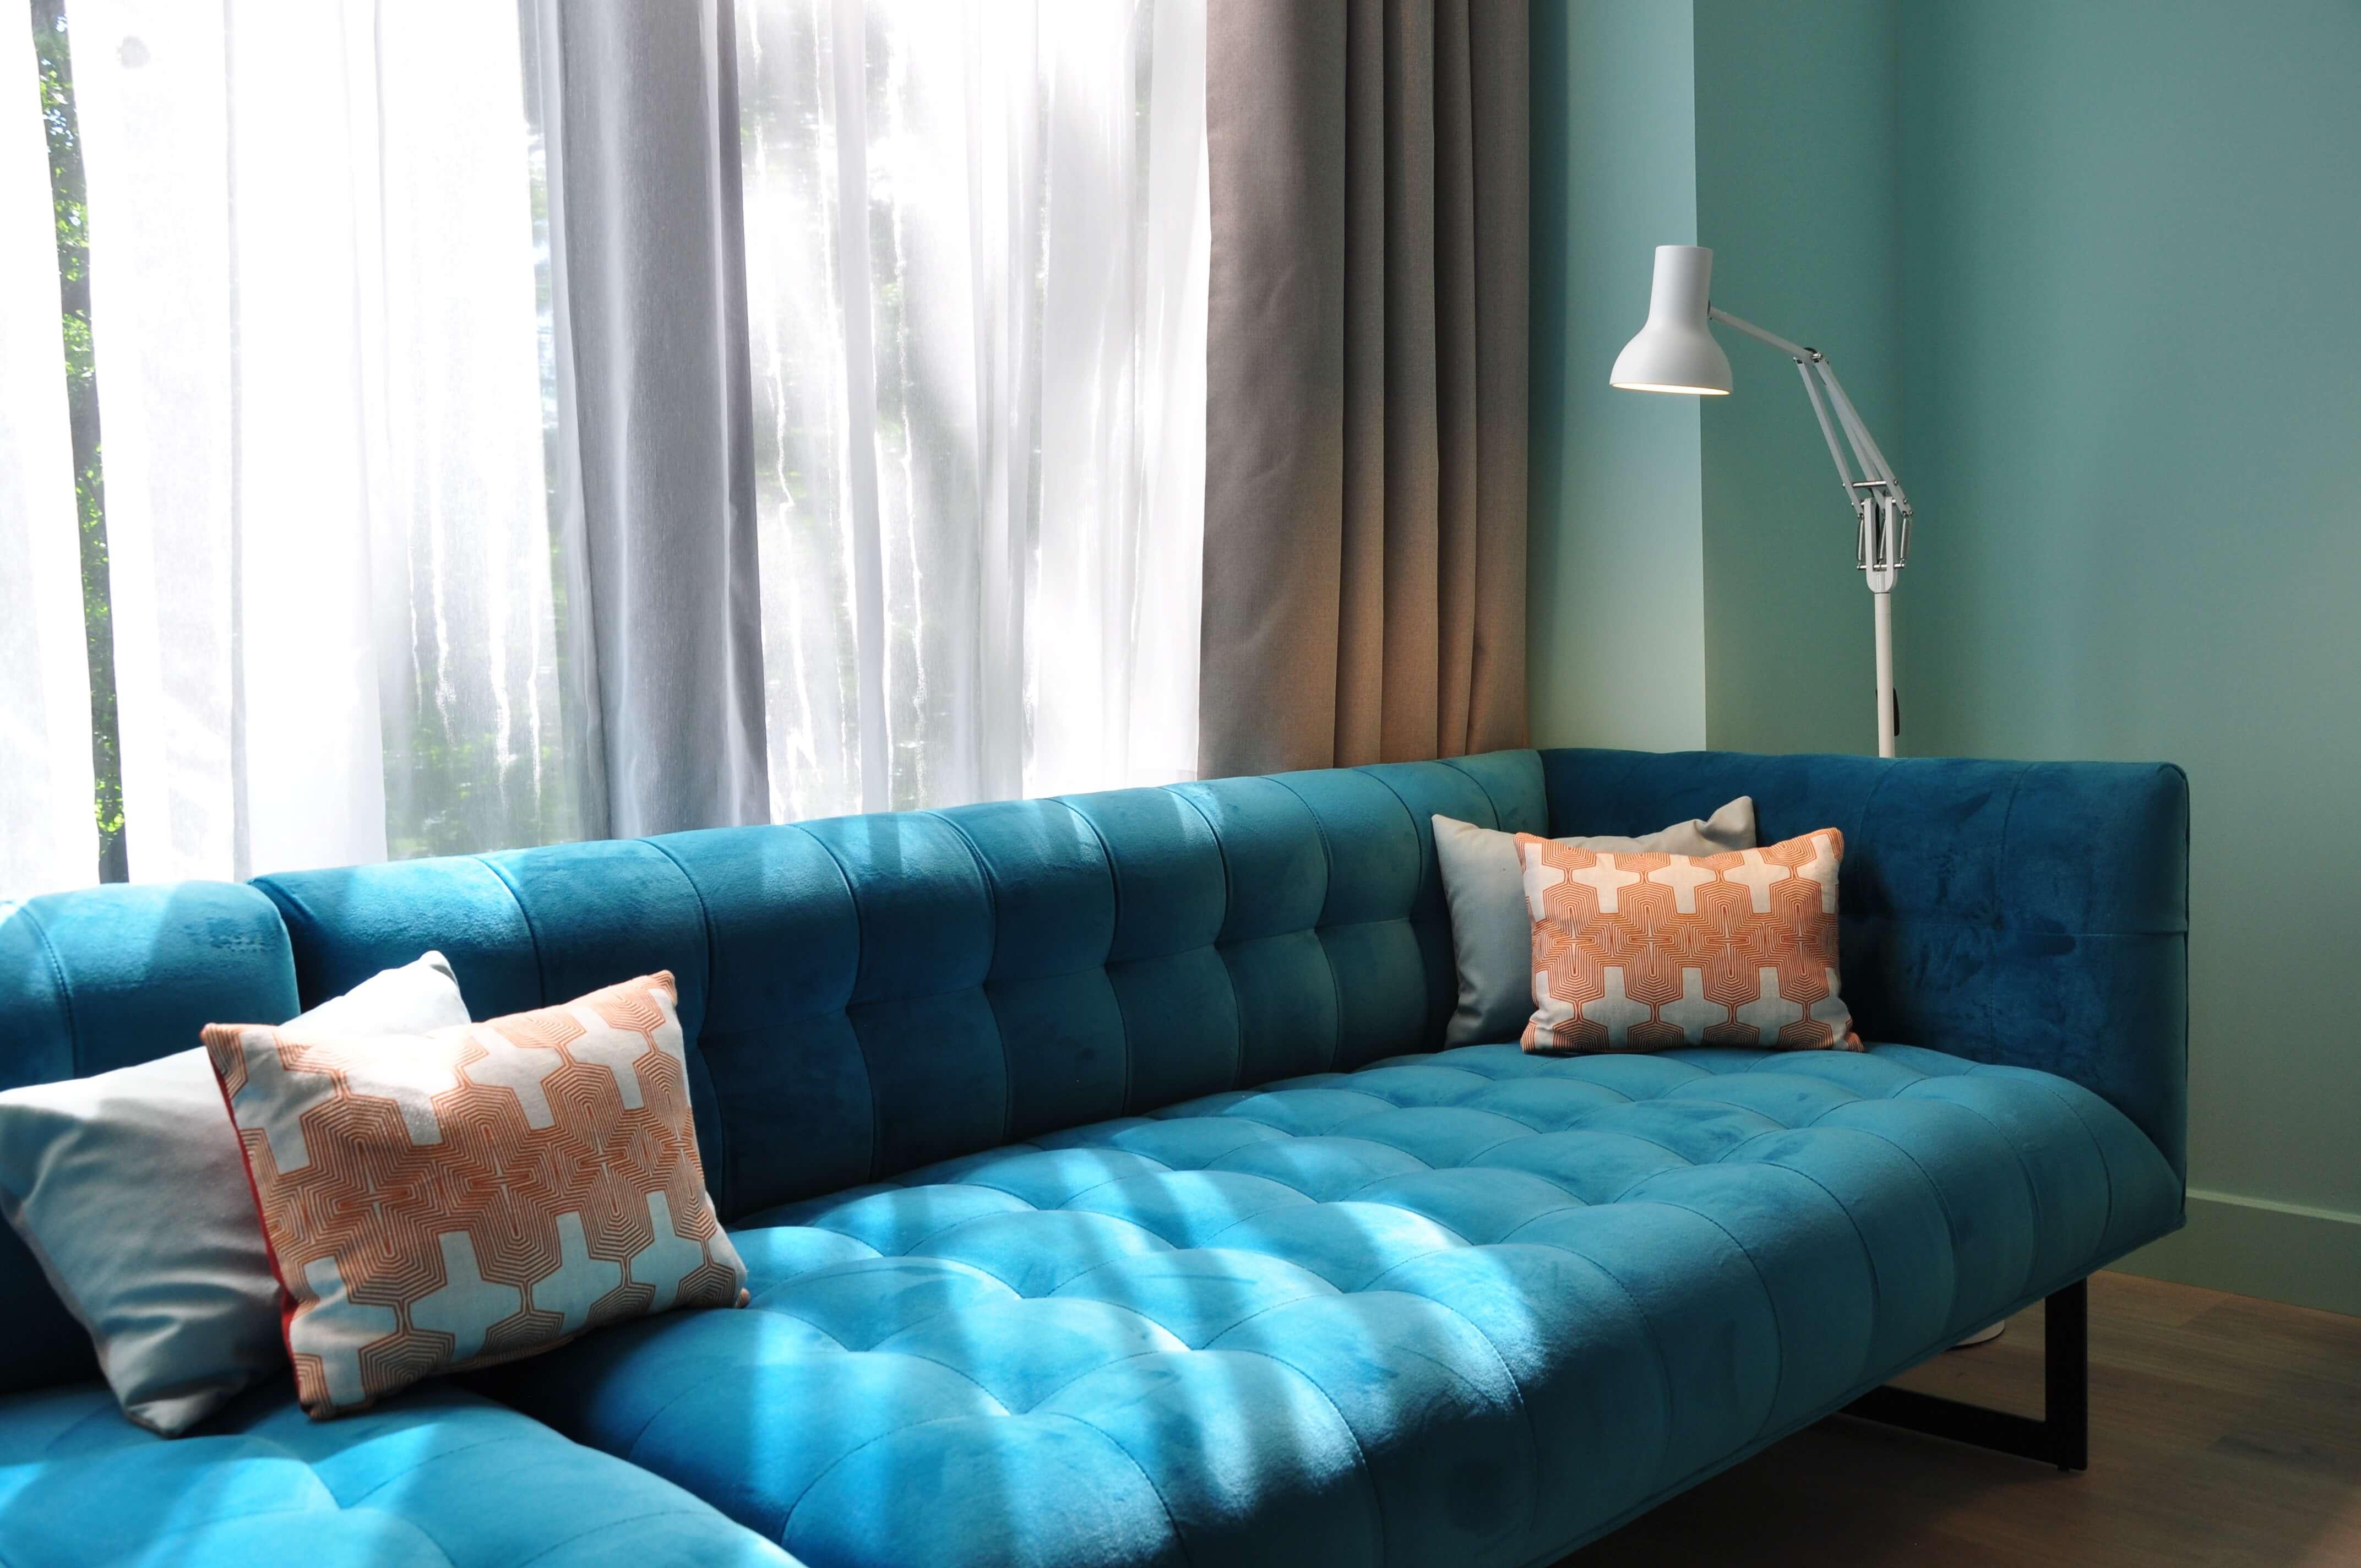 hotel interiors blue Verona sofa